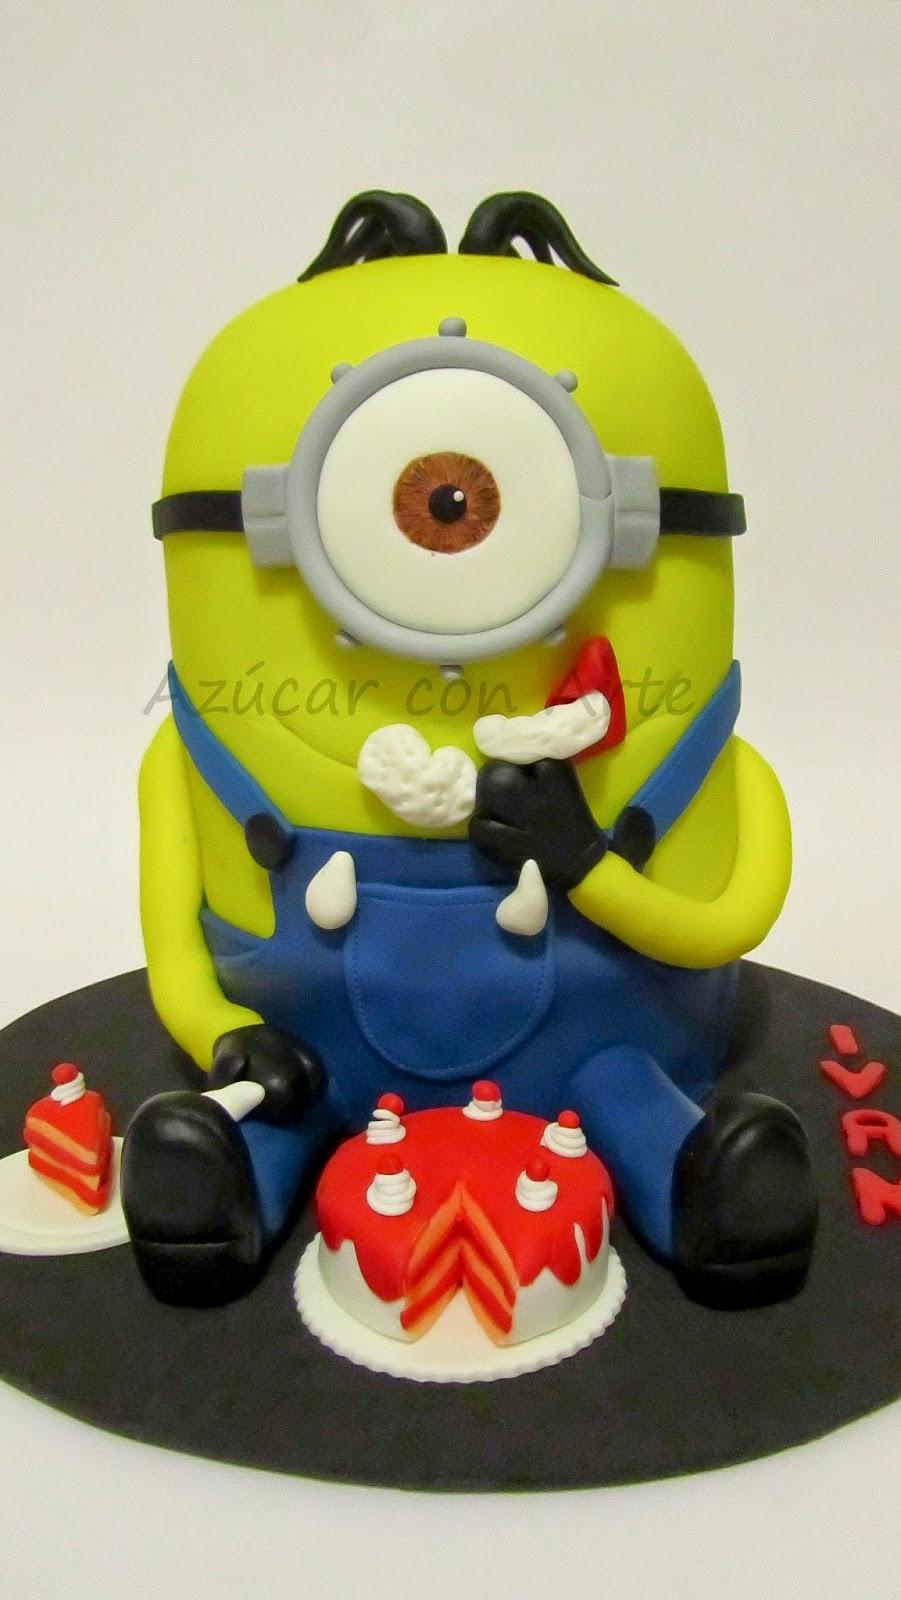 tarta minion, minion cake, tarta sin gluten, gluten free cake|azucar con arte